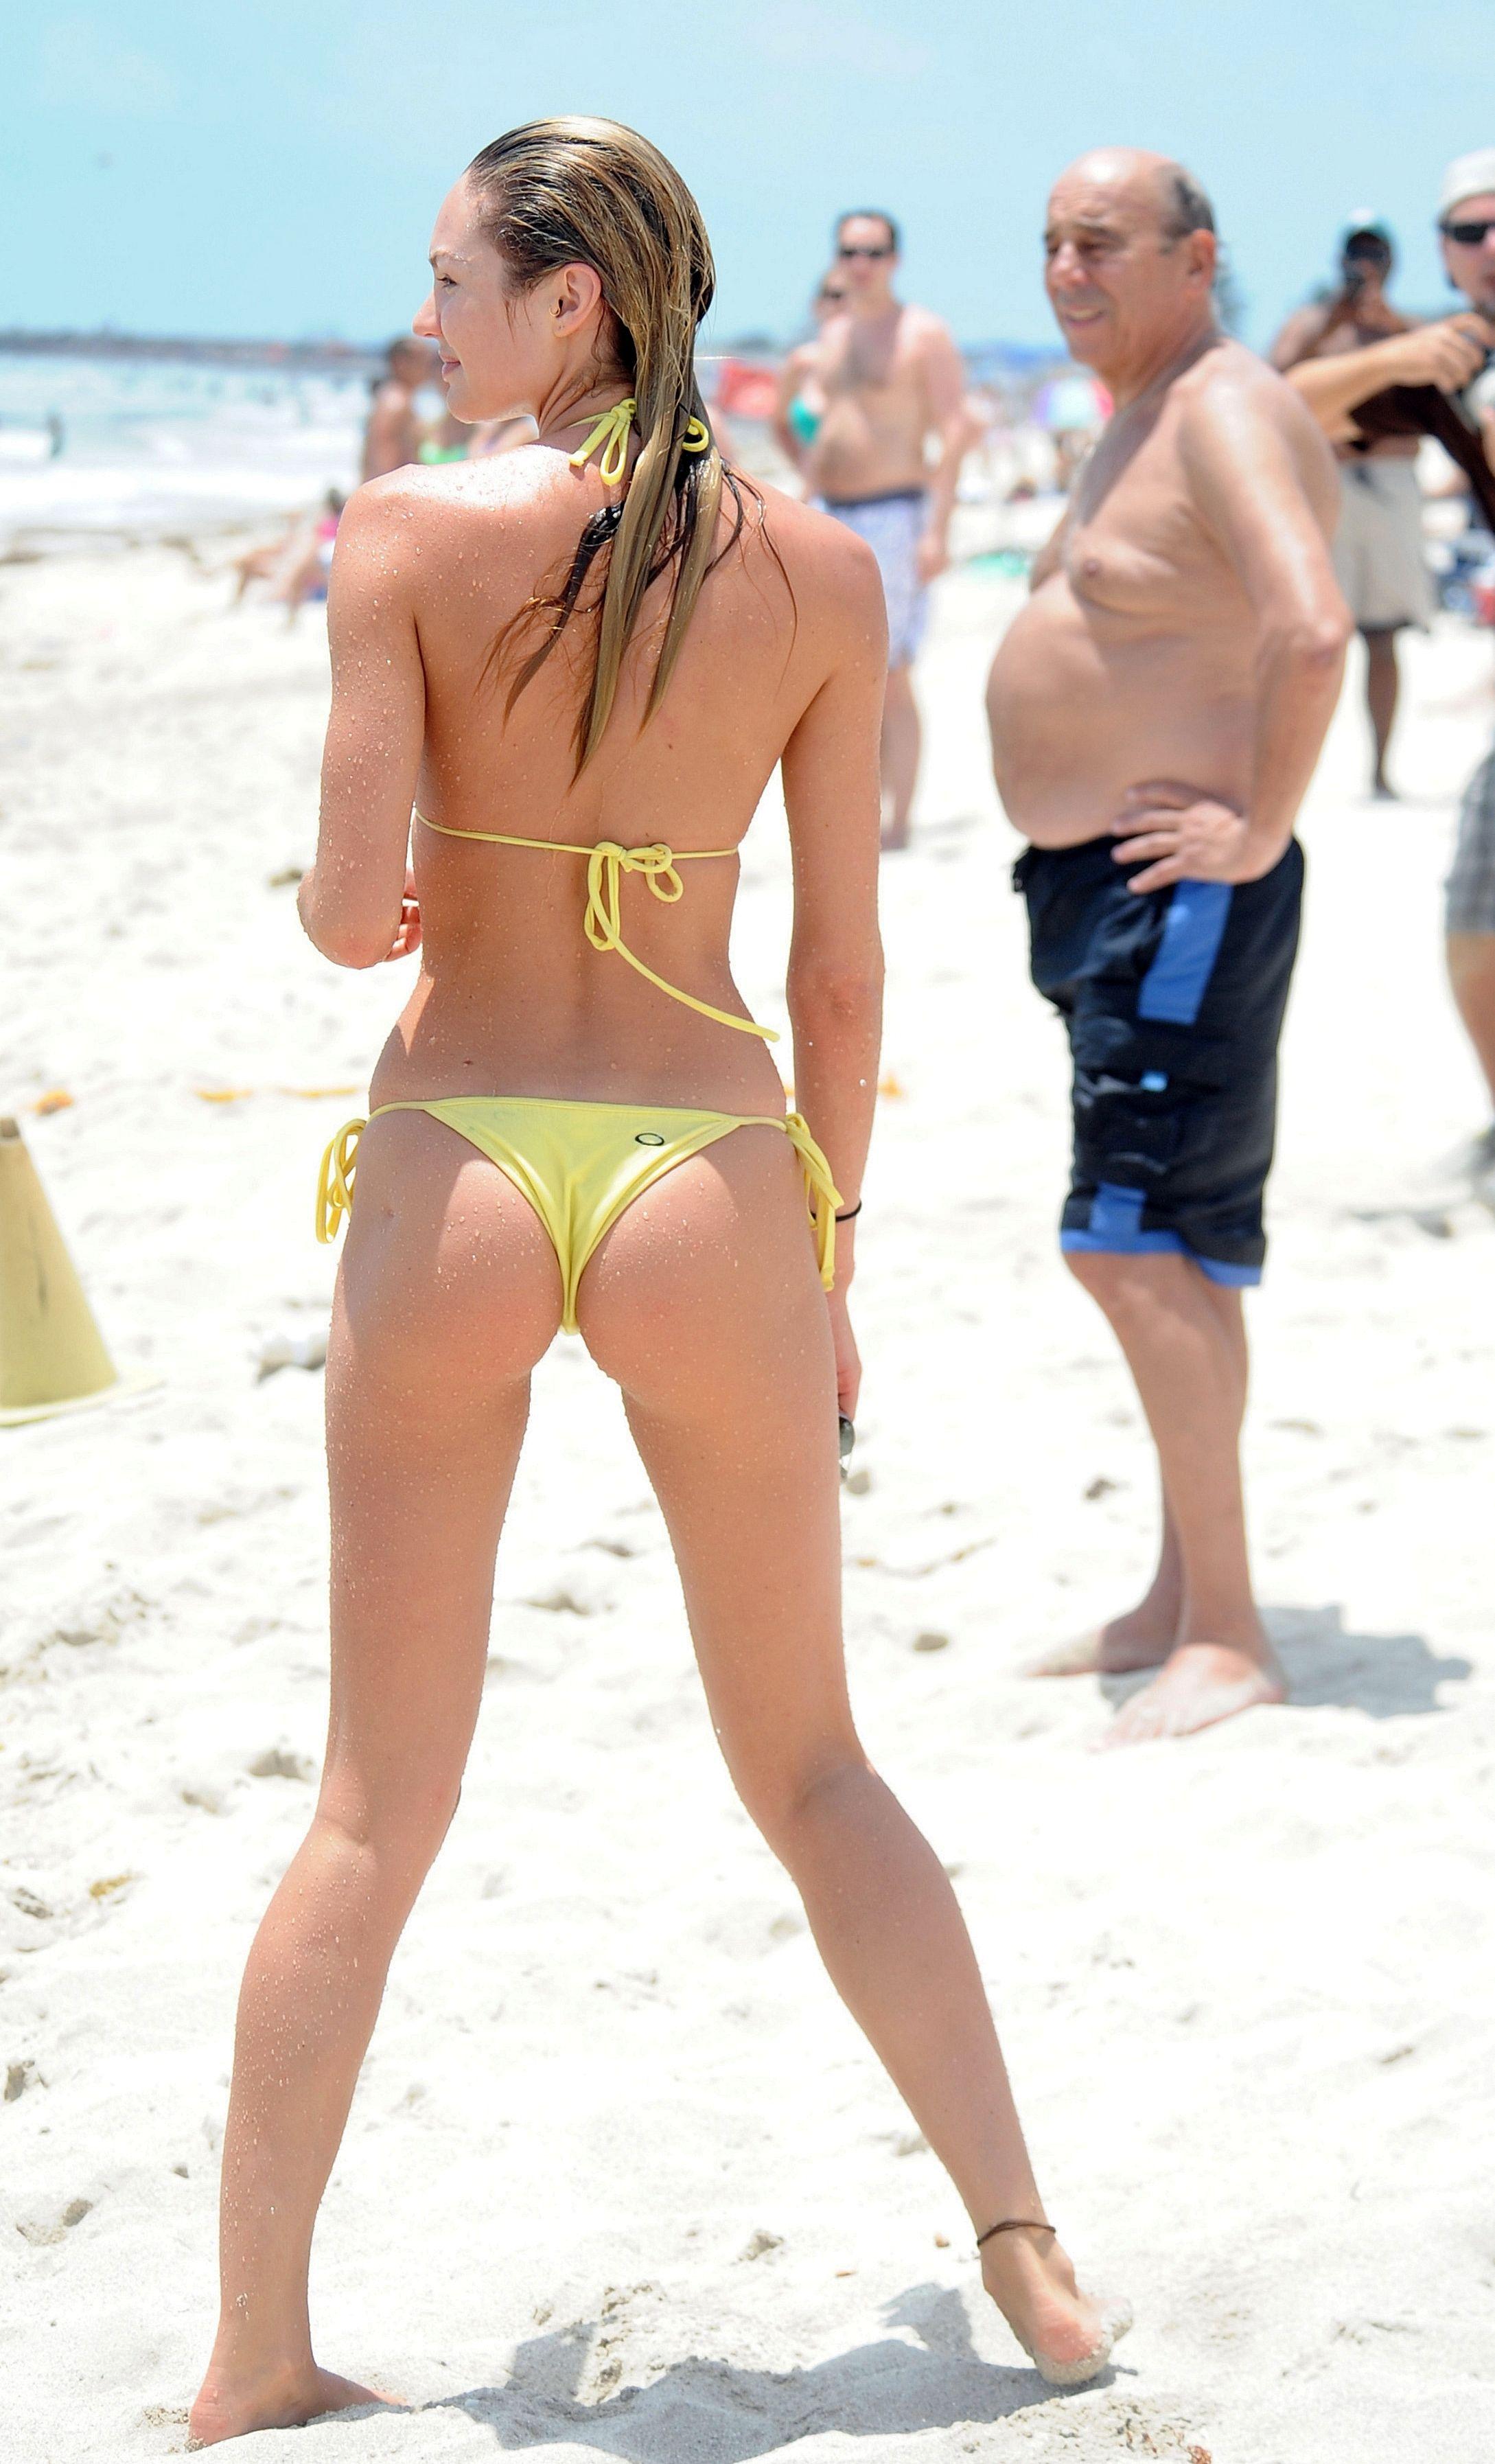 Candice Swanepoel nipples exposed